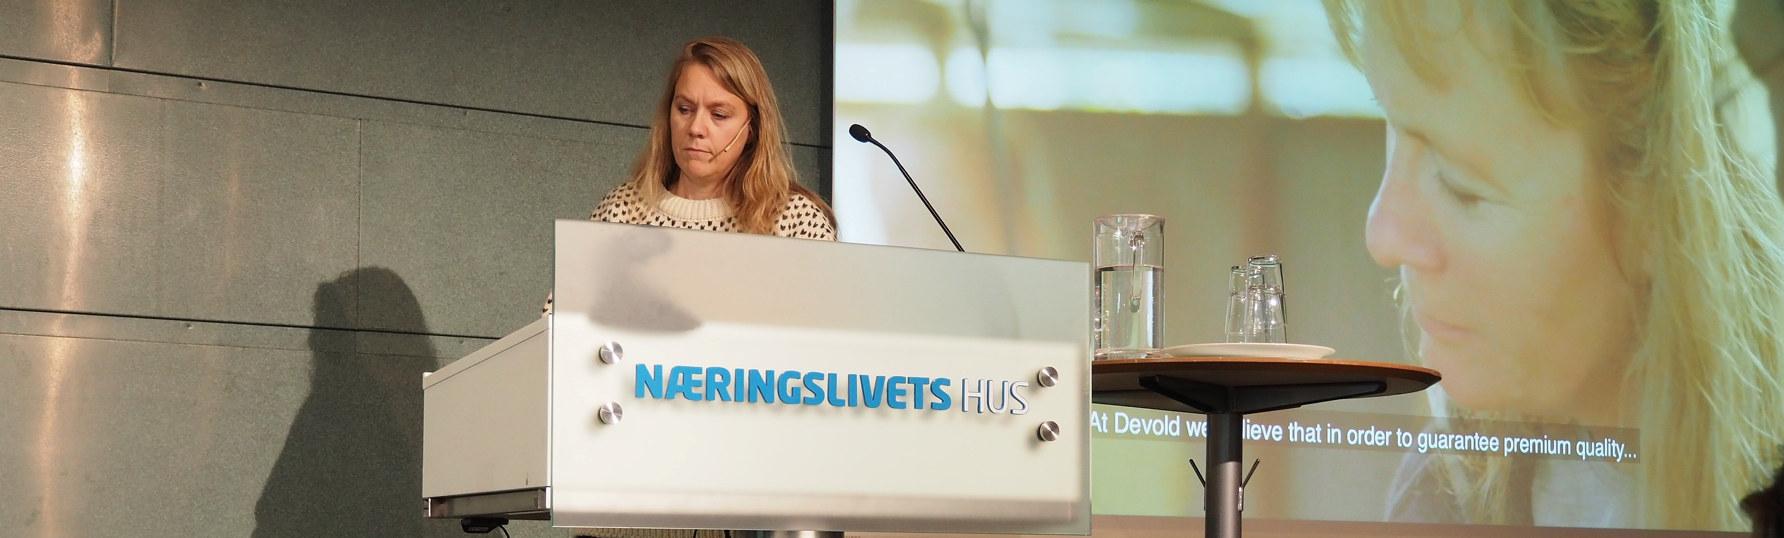 Markedsdirektør i Devold Gro Elisabeth Naalsund